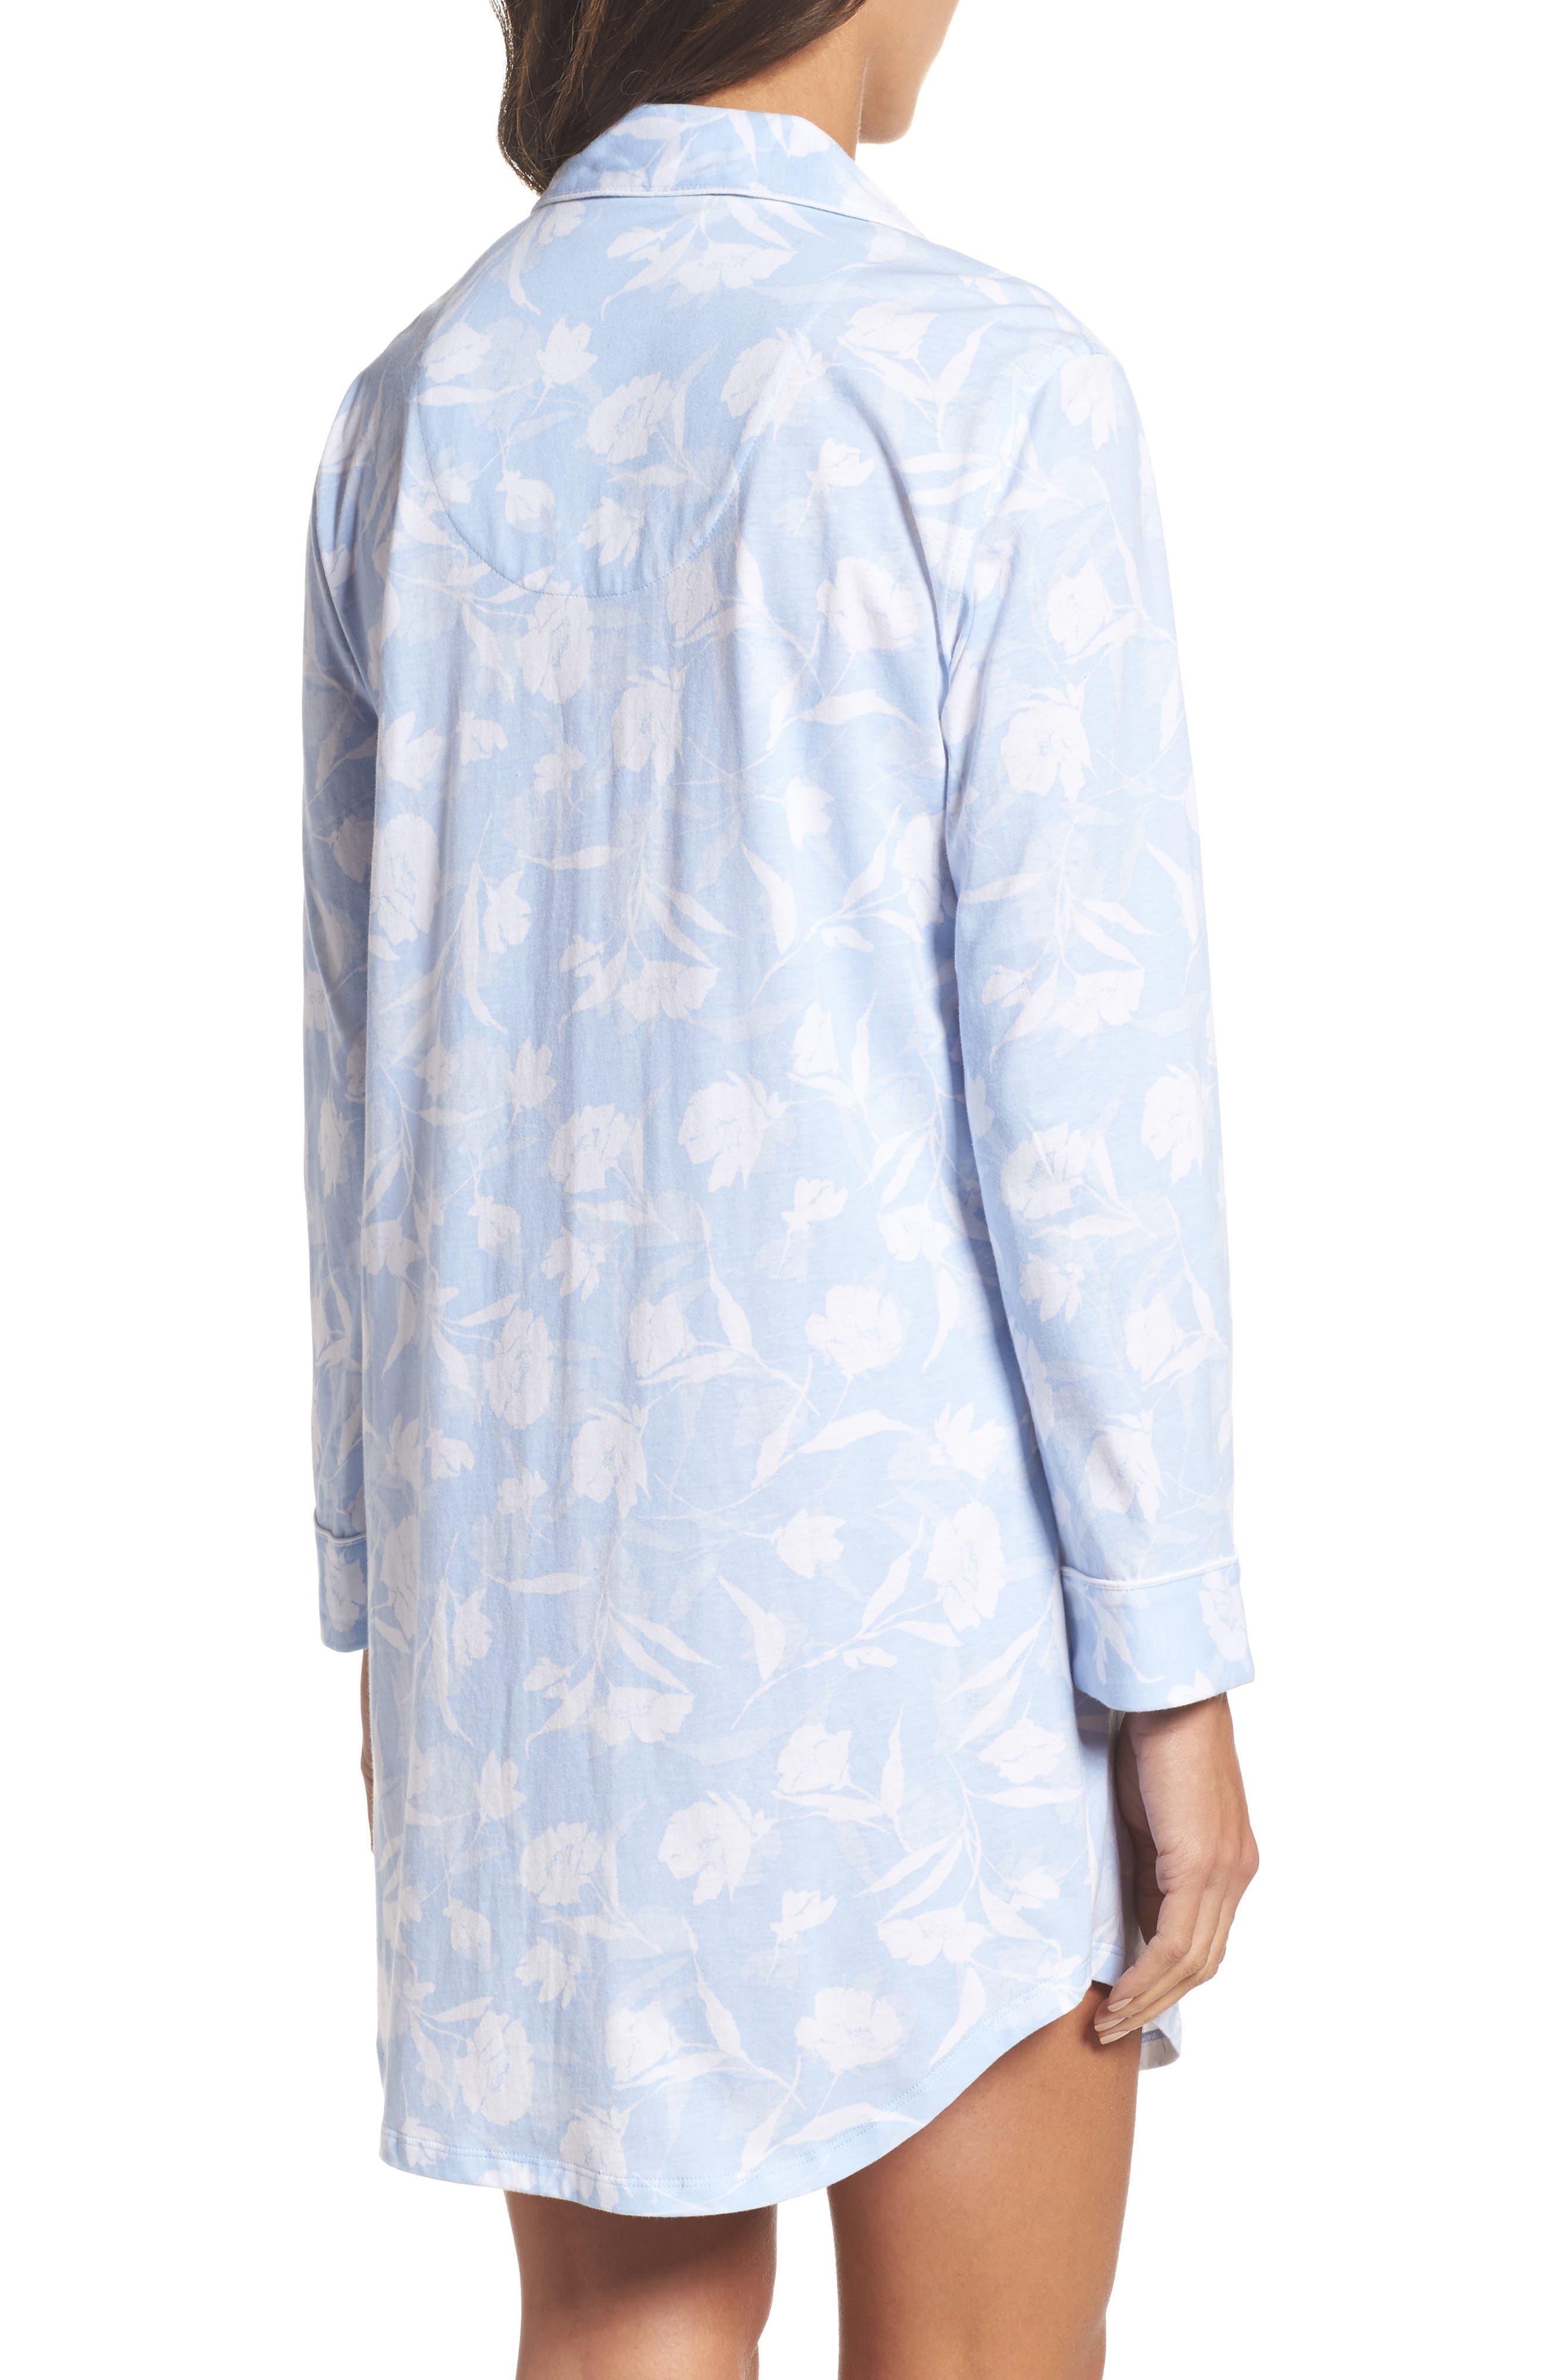 Notch Collar Sleep Shirt,                             Alternate thumbnail 2, color,                             Pale Blue Monotone Floral